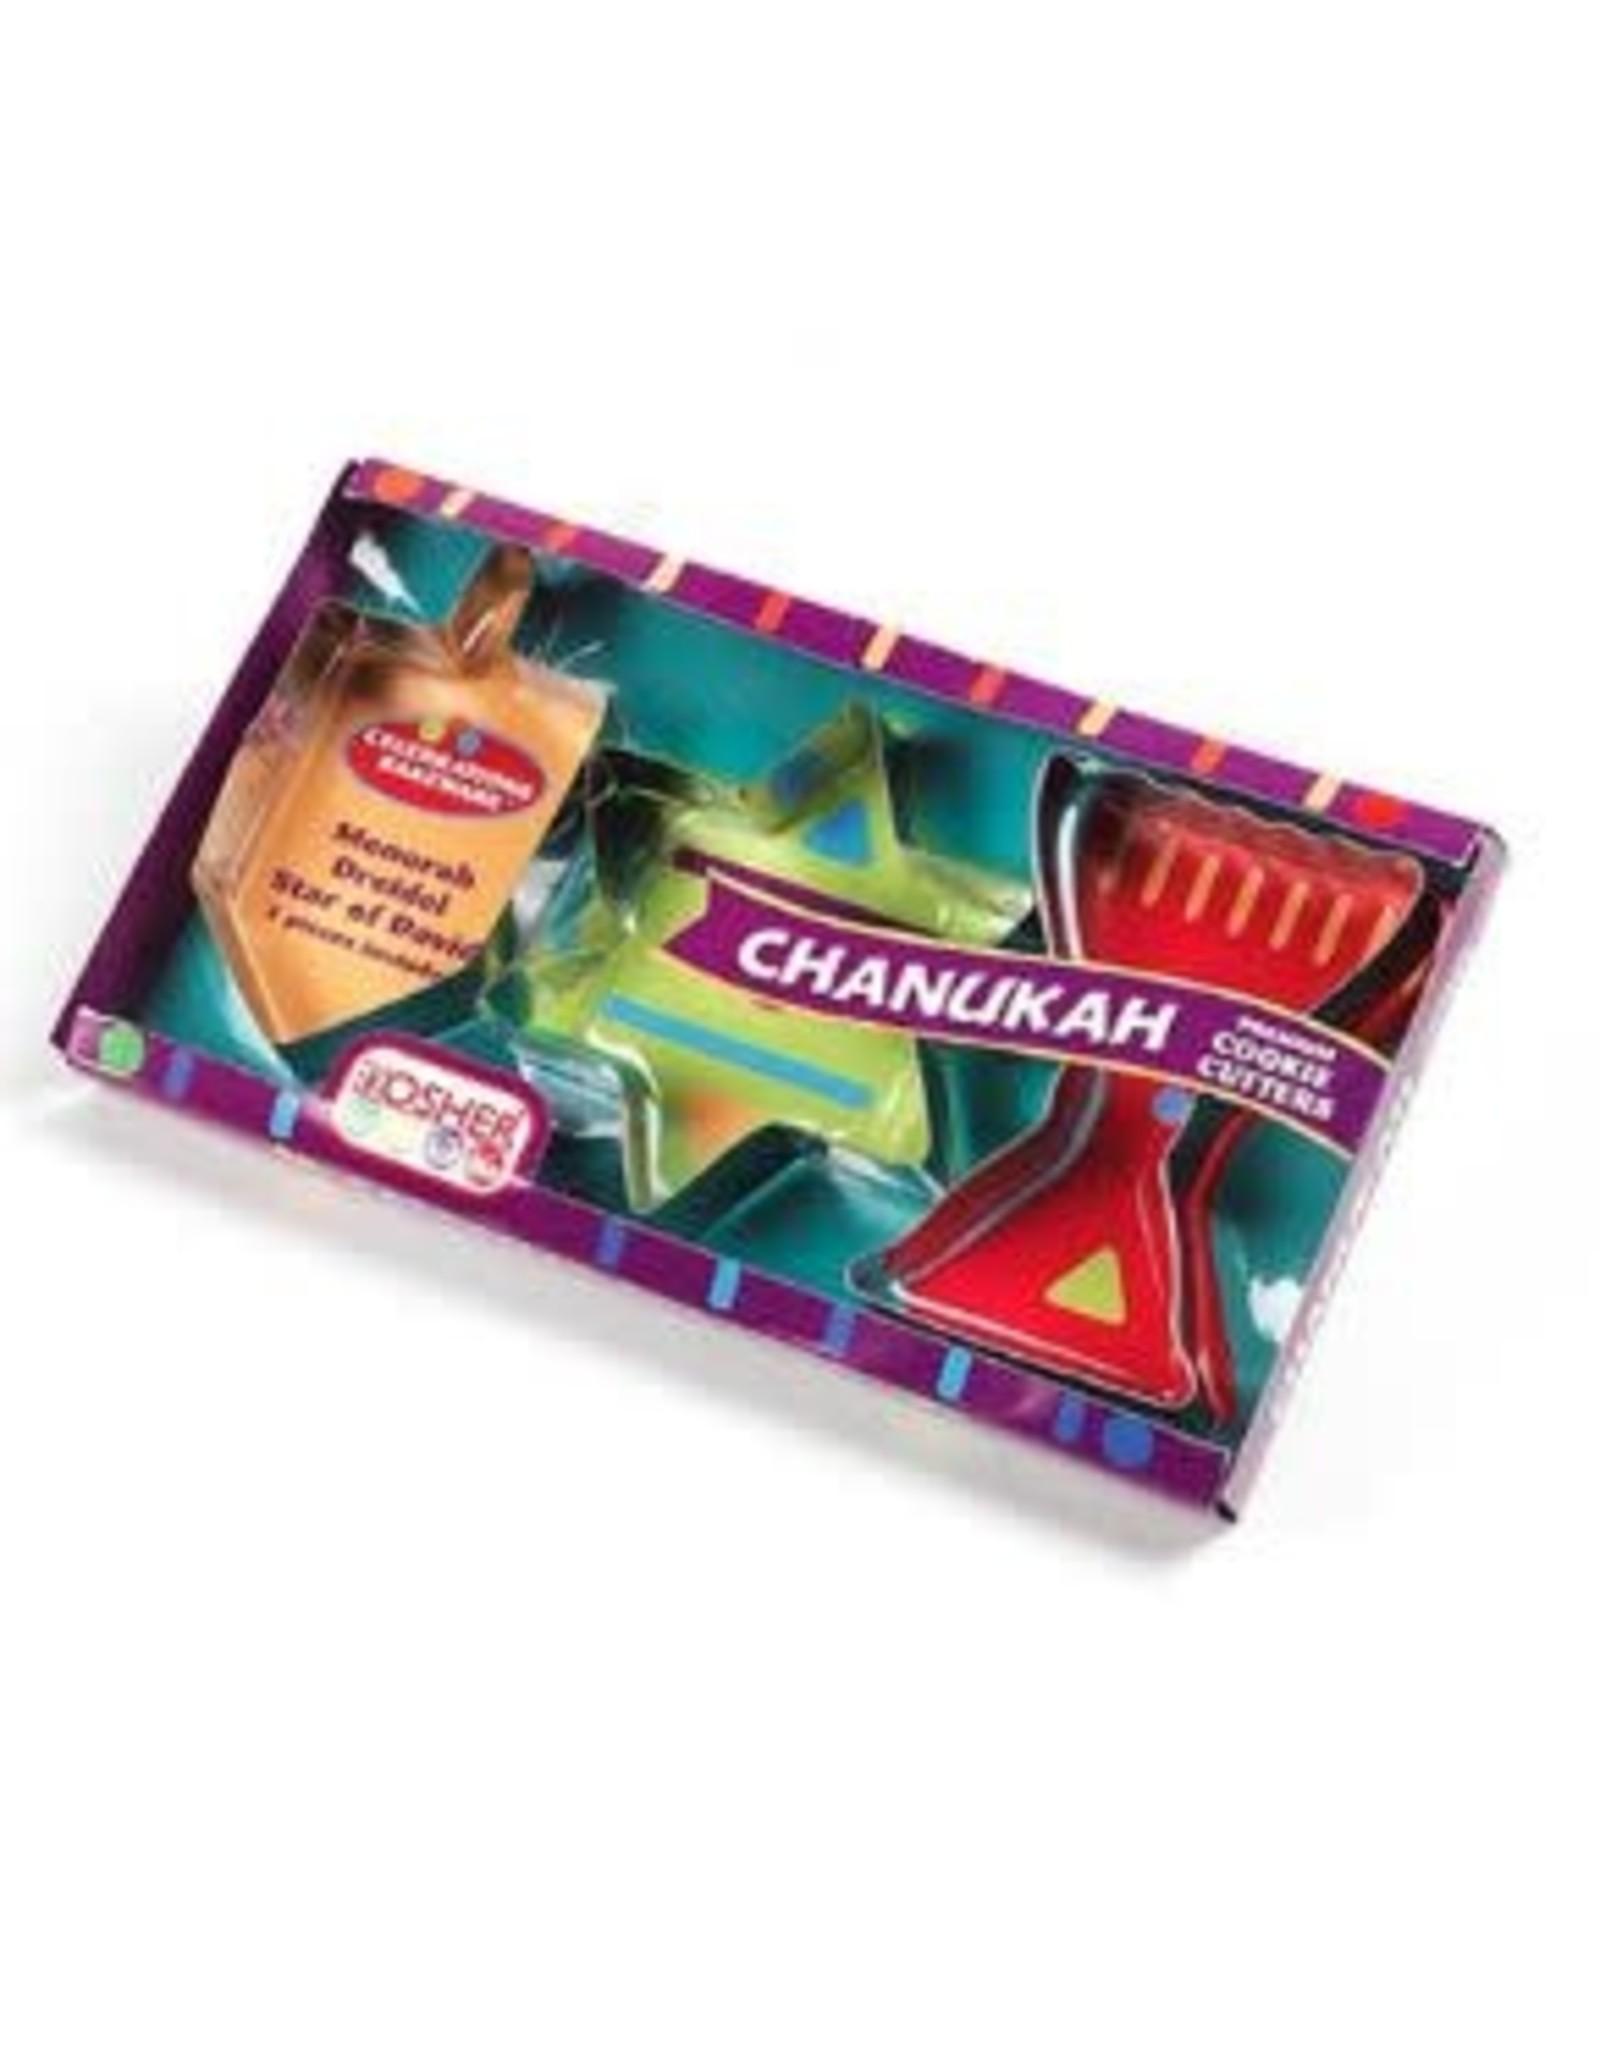 3 Pc Chanukah Cookie Cutter Set